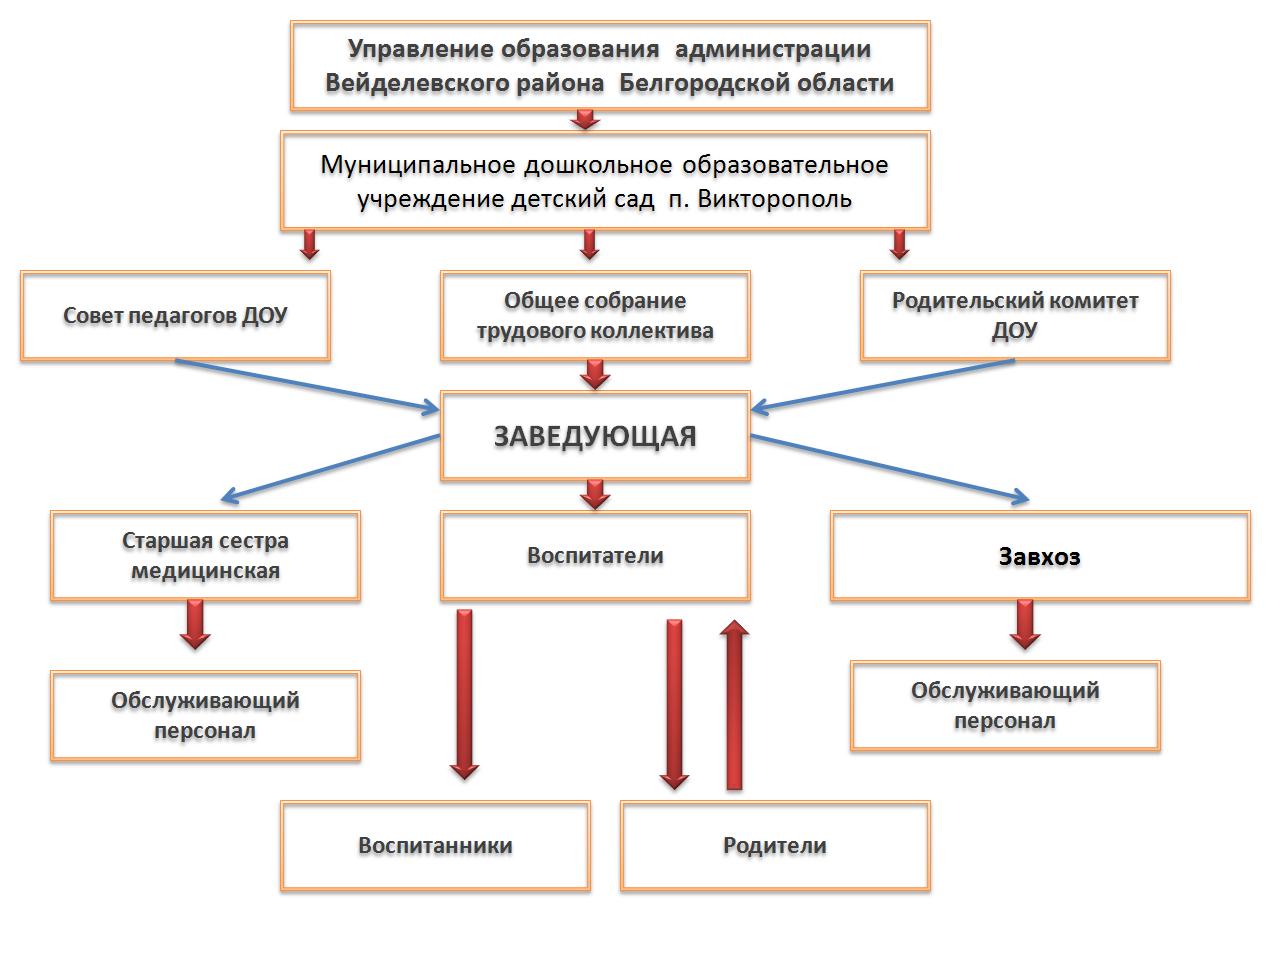 http://douvejd.ucoz.ru/Kartinki/STRUK/struktura_viktoropol.png